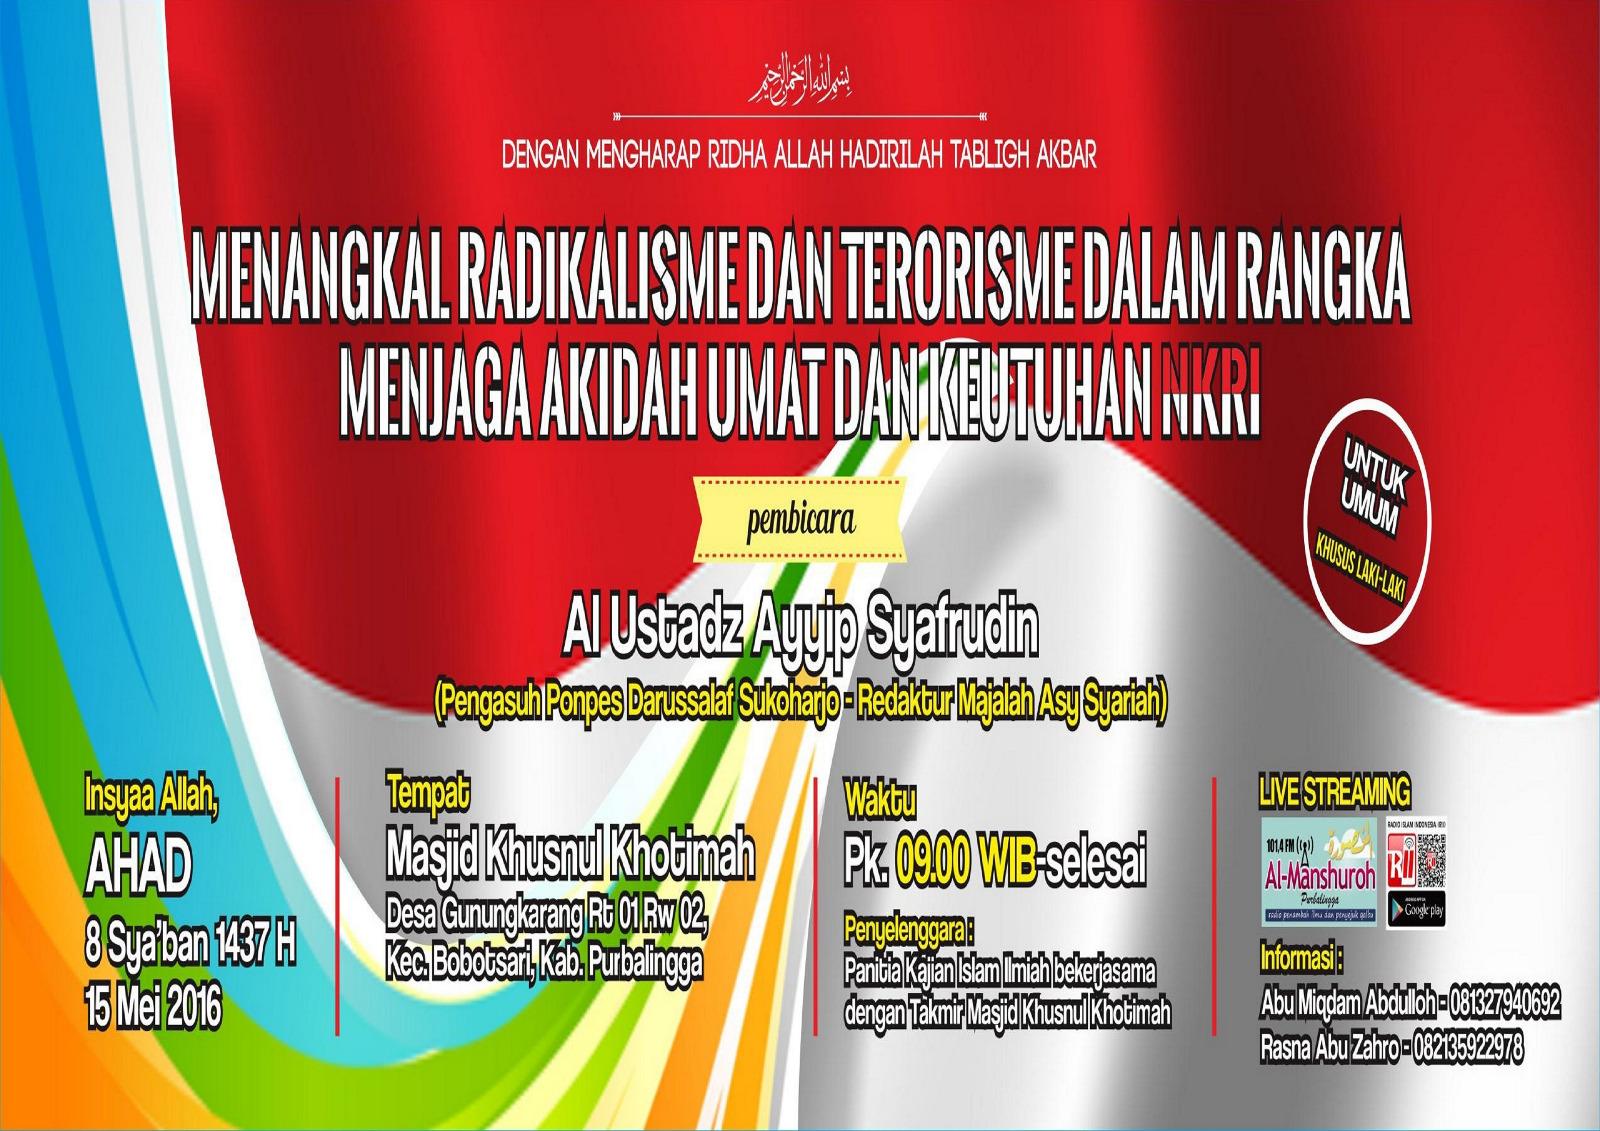 "Pamflet HADIRILAH Tabligh Akbar Ahlussunnah wal Jamaah ""MENANGKAL RADIKALISME DAN TERORISME DALAM RANGKA MENJAGA AQIDAH UMAT DAN KEUTUHAN NKRI "" 8 Sya'ban 1437 H / 15 Mei 2016"